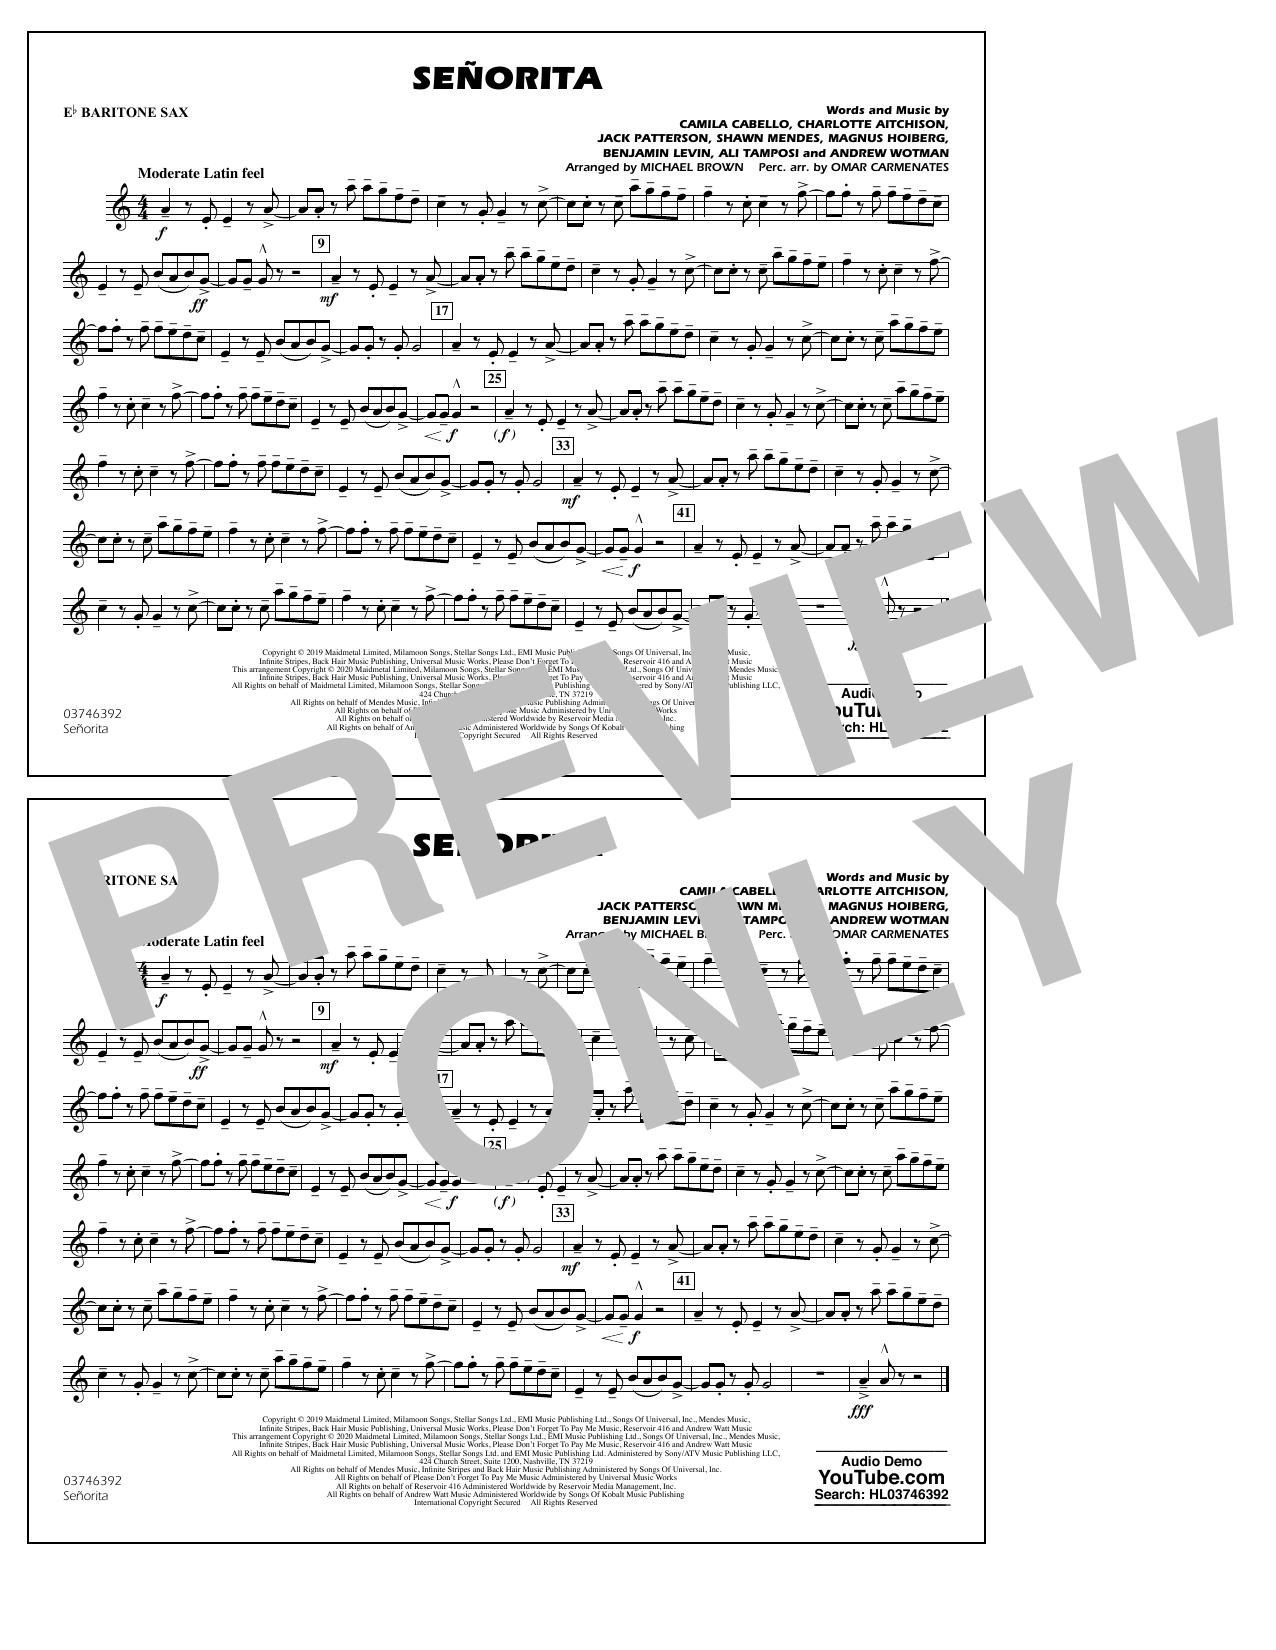 Shawn Mendes & Camila Cabello Señorita (arr. Carmenates and Brown) - Eb Baritone Sax sheet music notes and chords. Download Printable PDF.